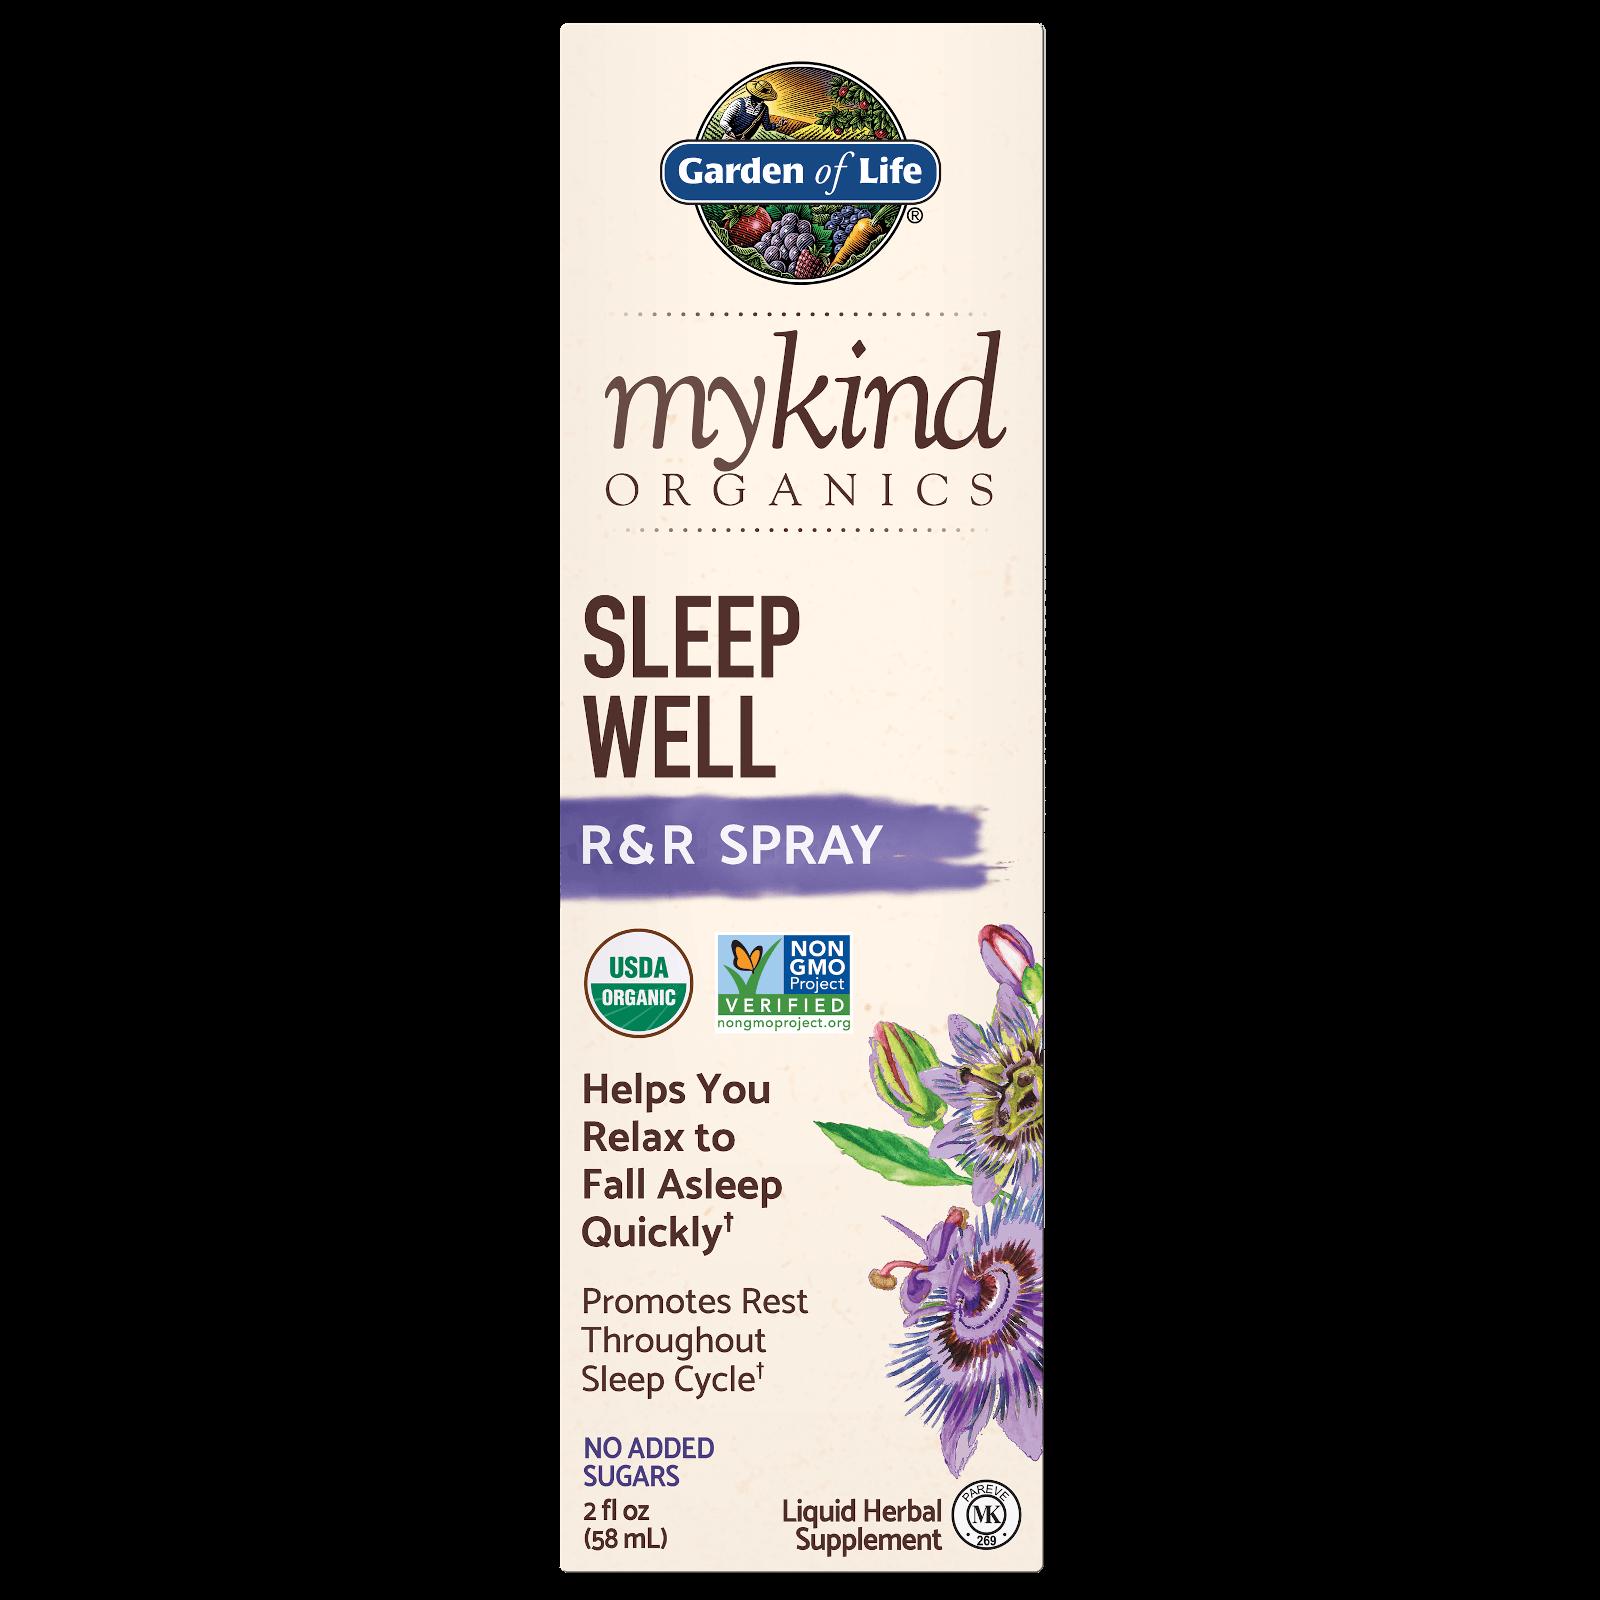 mykind Organics Kruidenmengsel voor de Nacht Spray - 58 ml